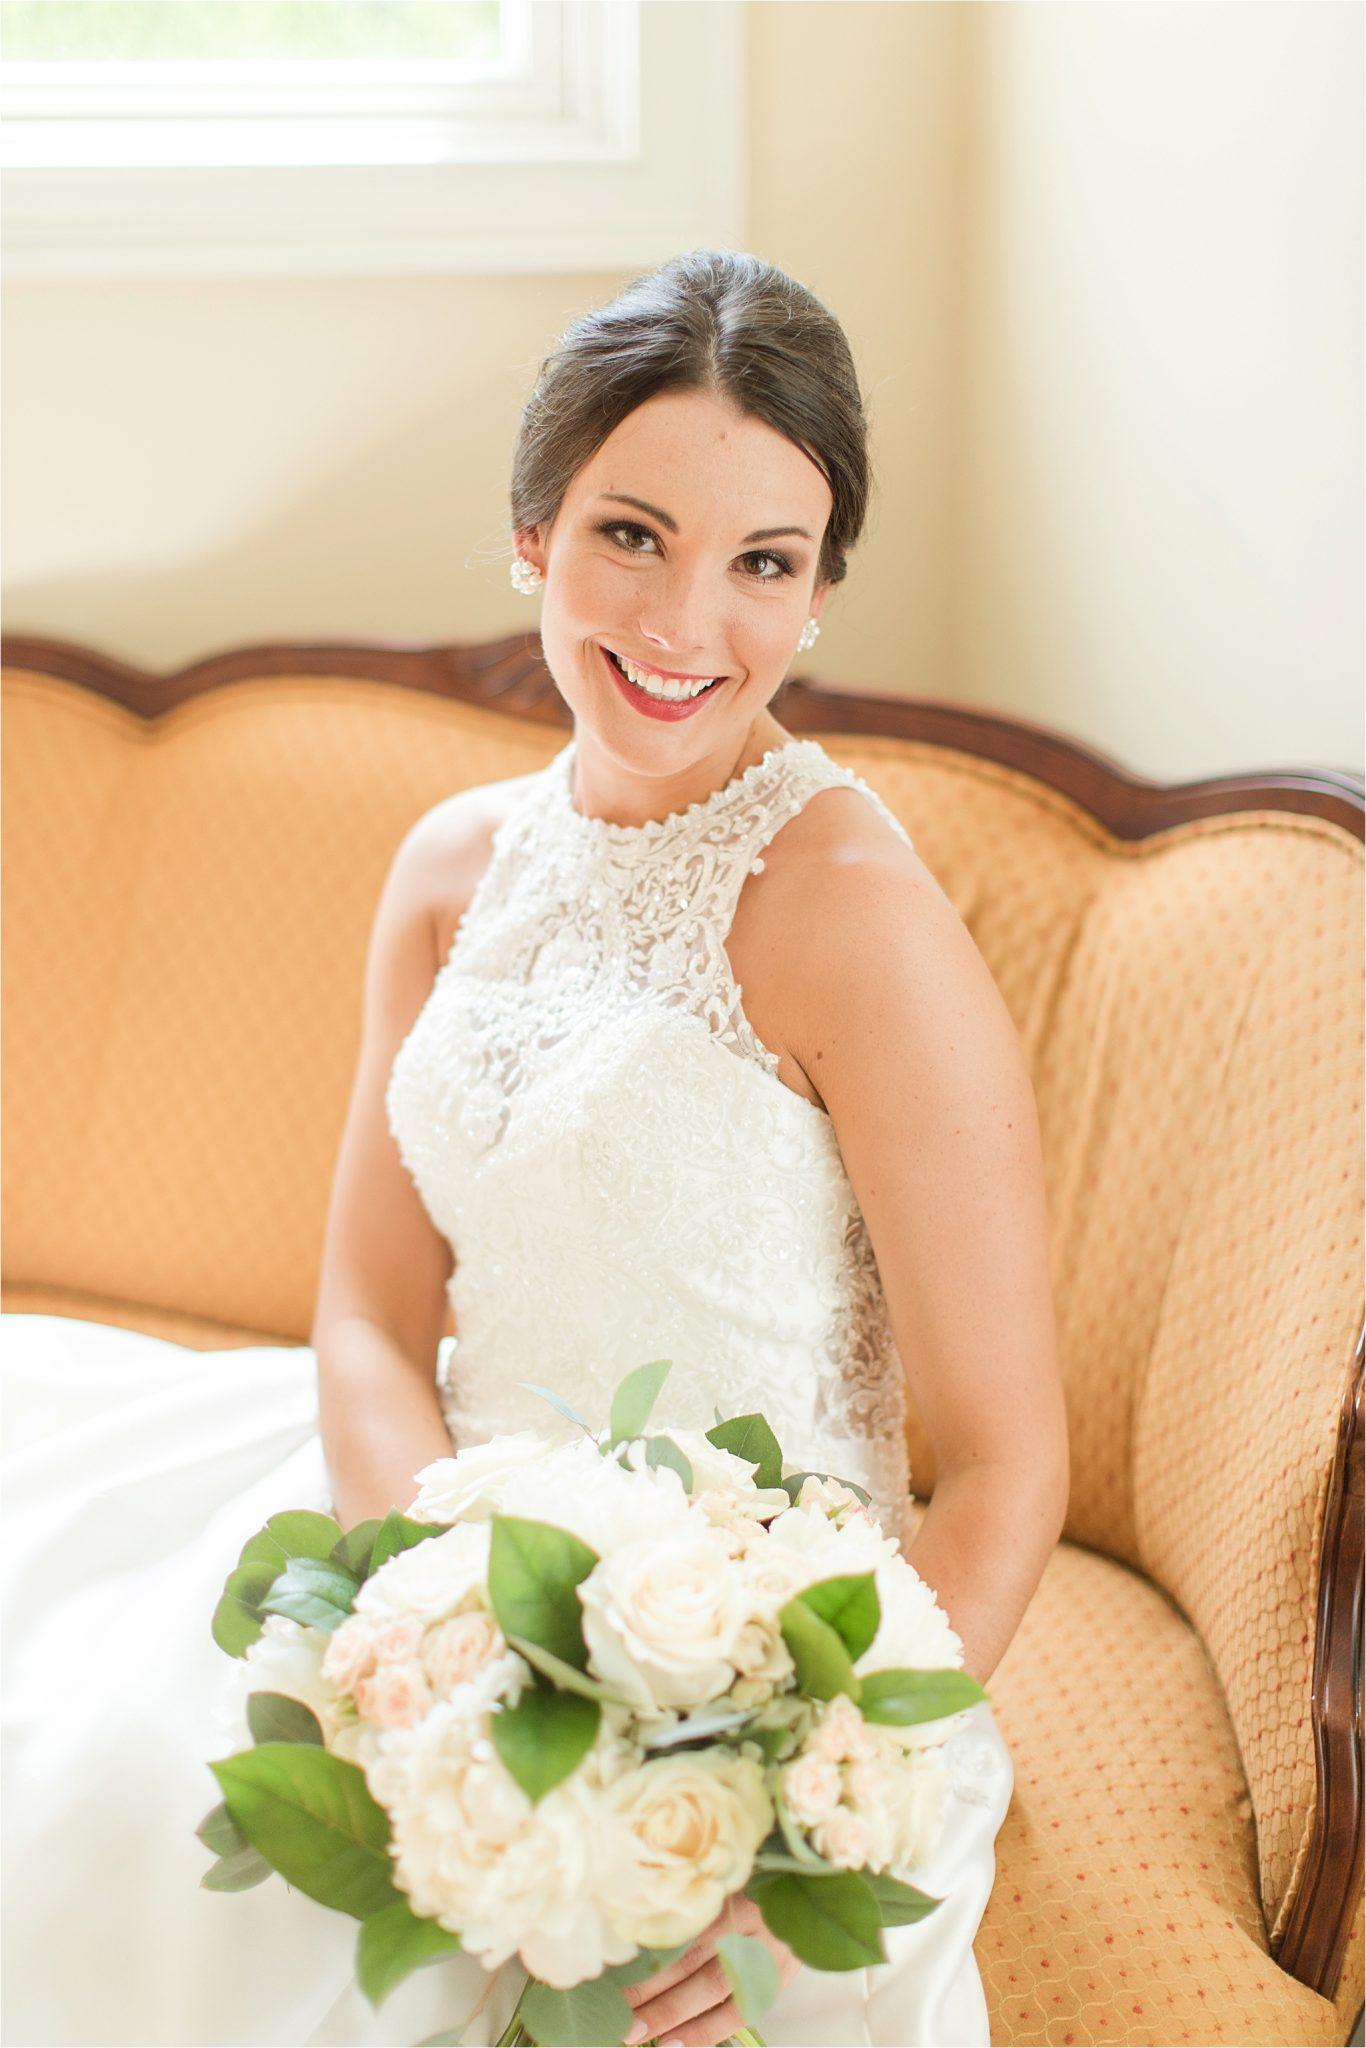 Sonnet House, Birmingham Alabama Wedding Photographer, Bridal shoot, Wedding bouquet